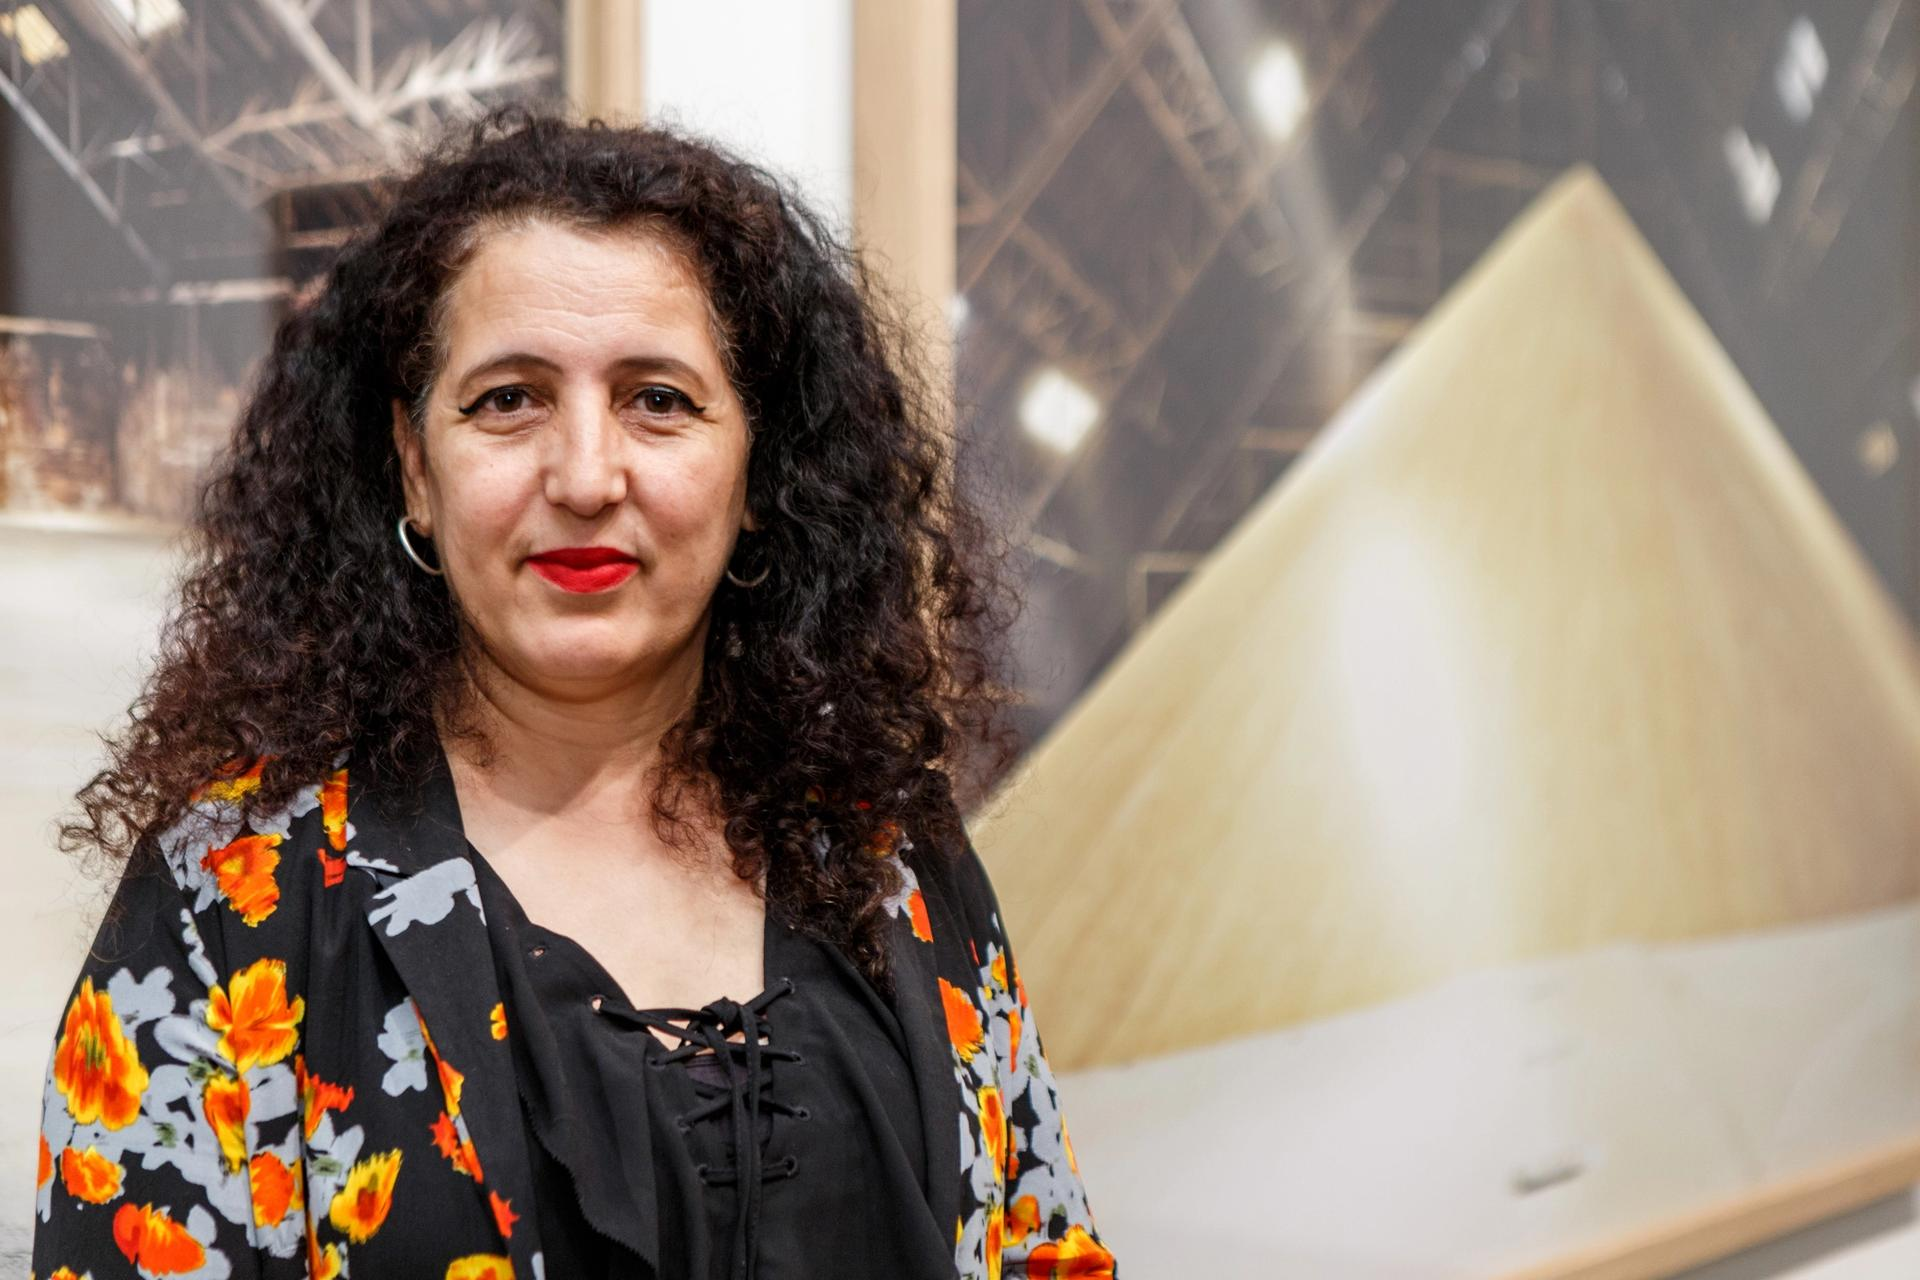 Zineb Sedira Photo: Musthafa Aboobacker. Courtesy of Third Line gallery